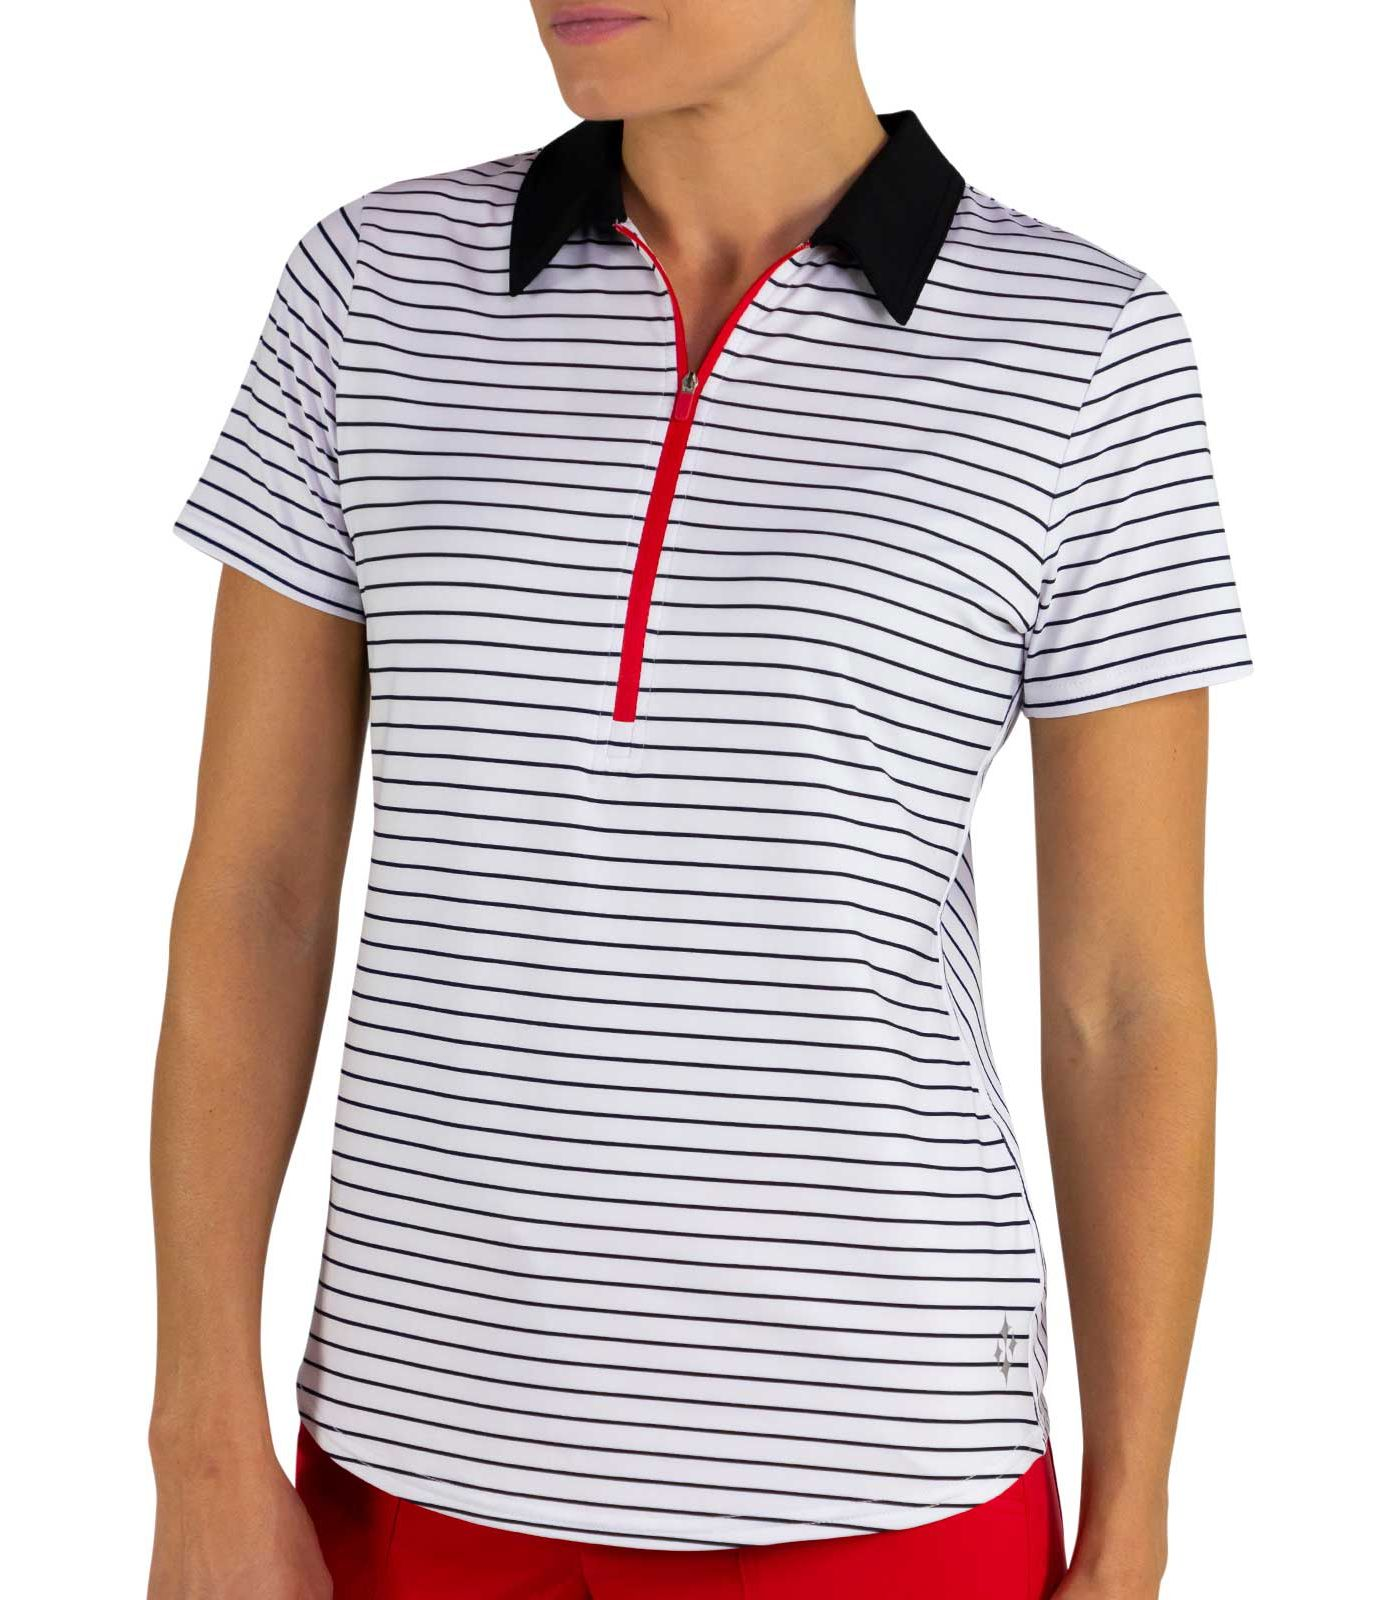 Jofit Women's Zip Golf Polo